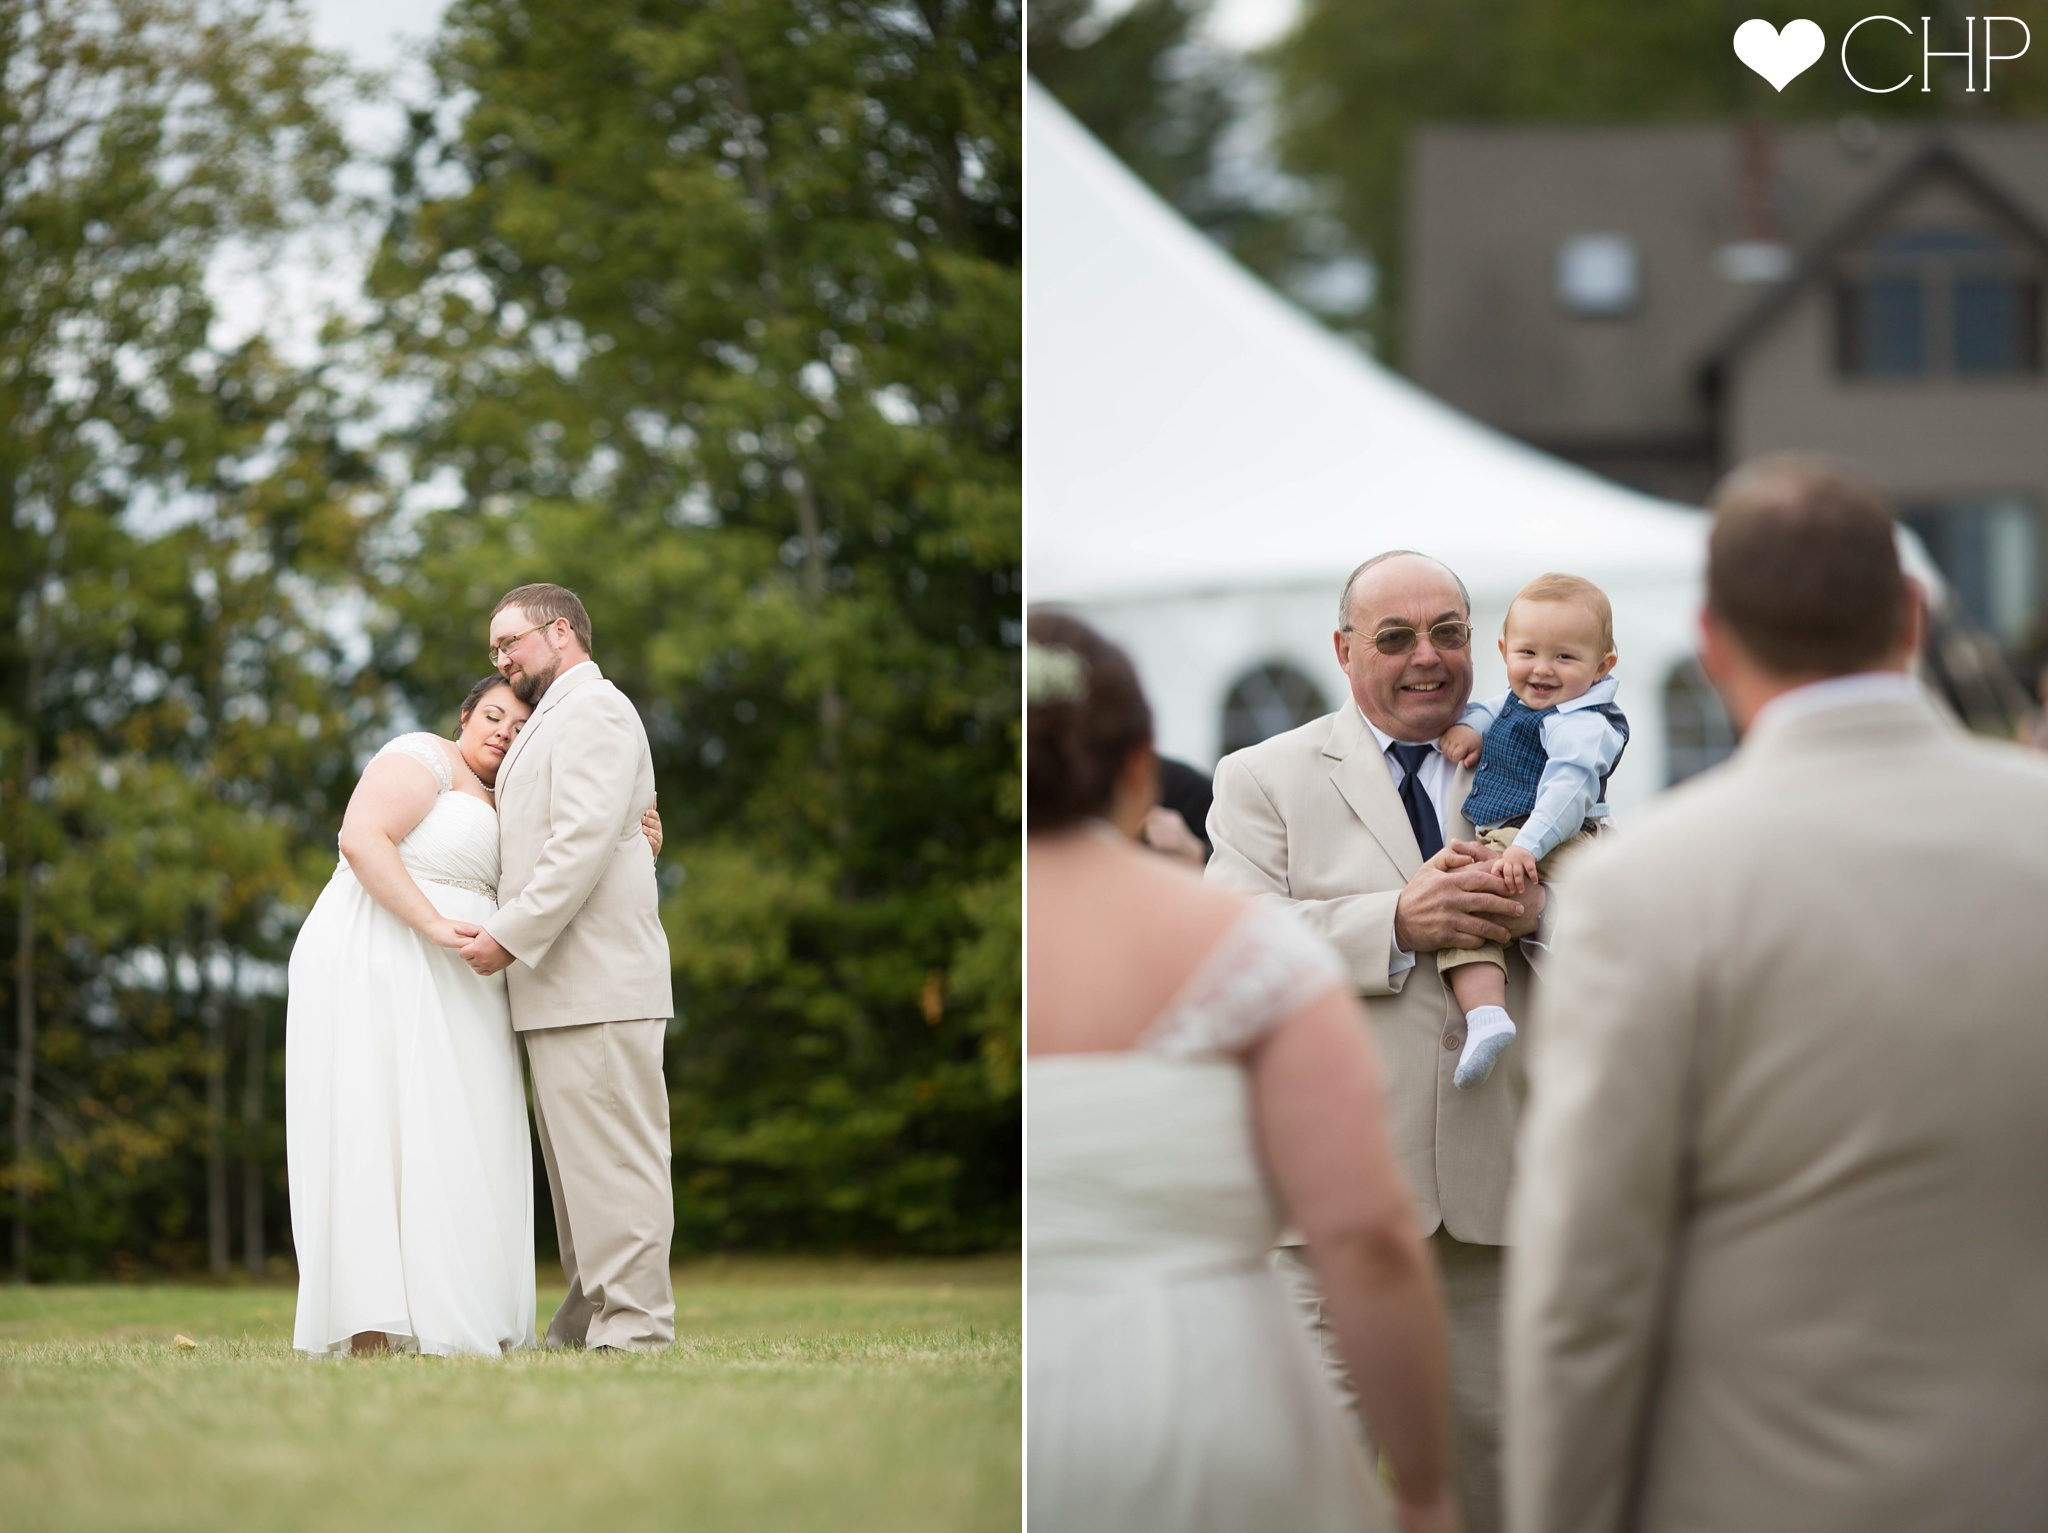 Wedding-Photographs-taken-in-Eastbrook-Maine